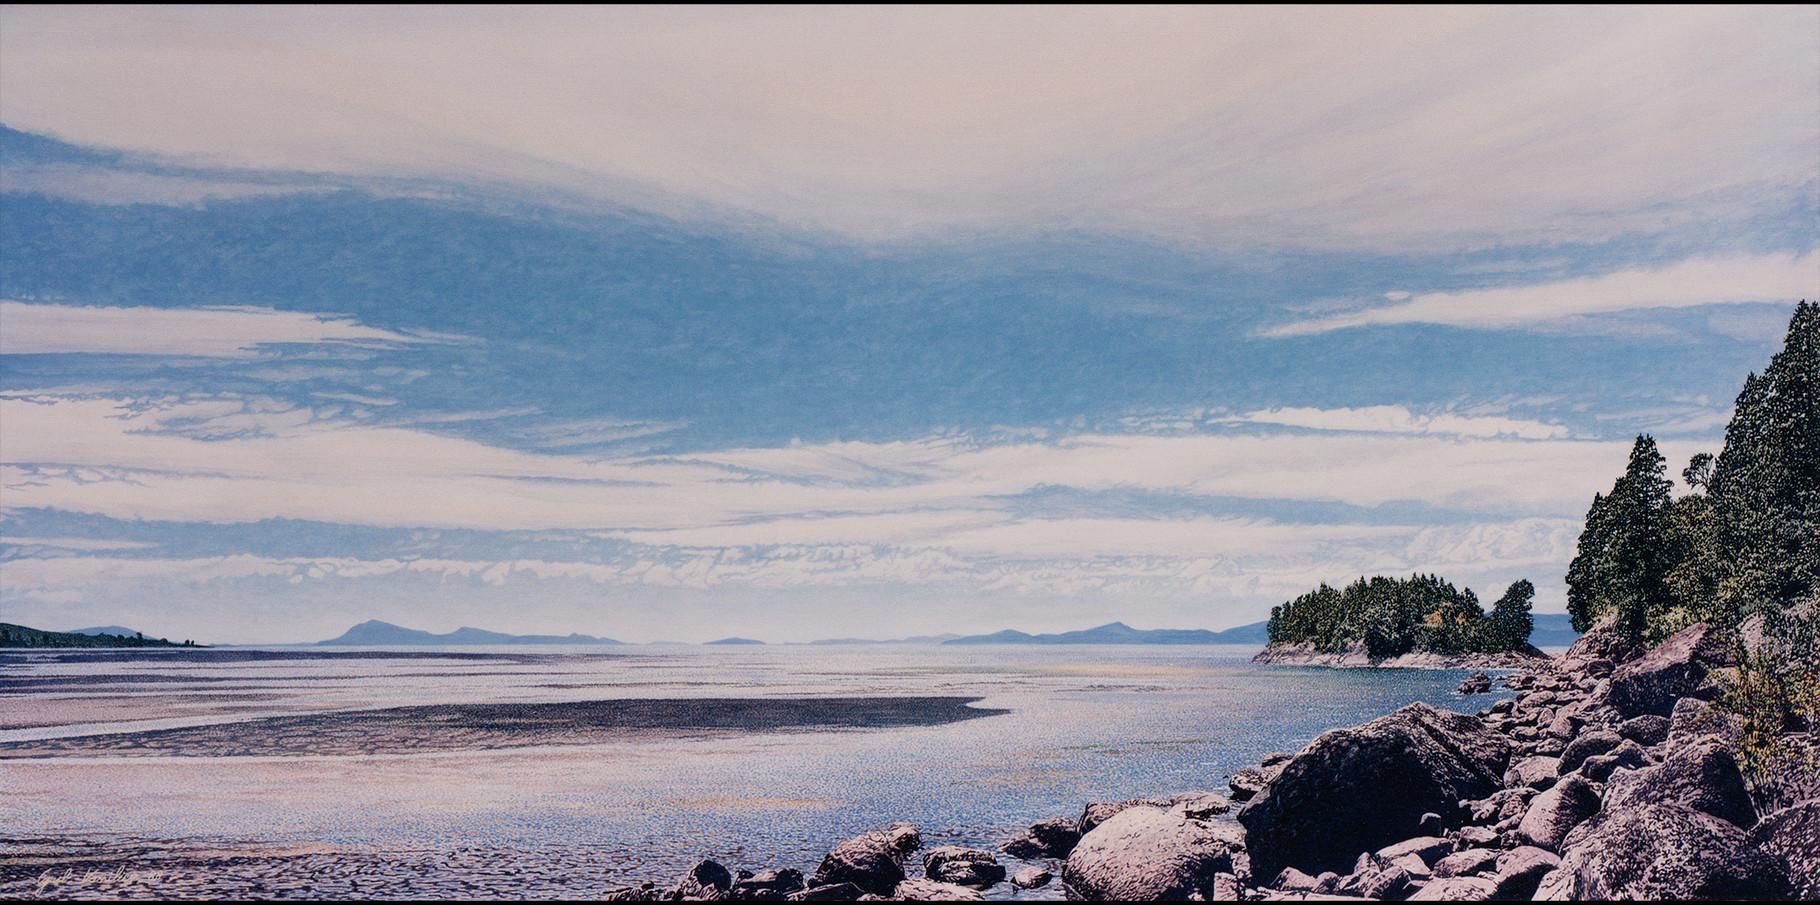 lago Ranco  Acrylique sur toile  195x97 1992